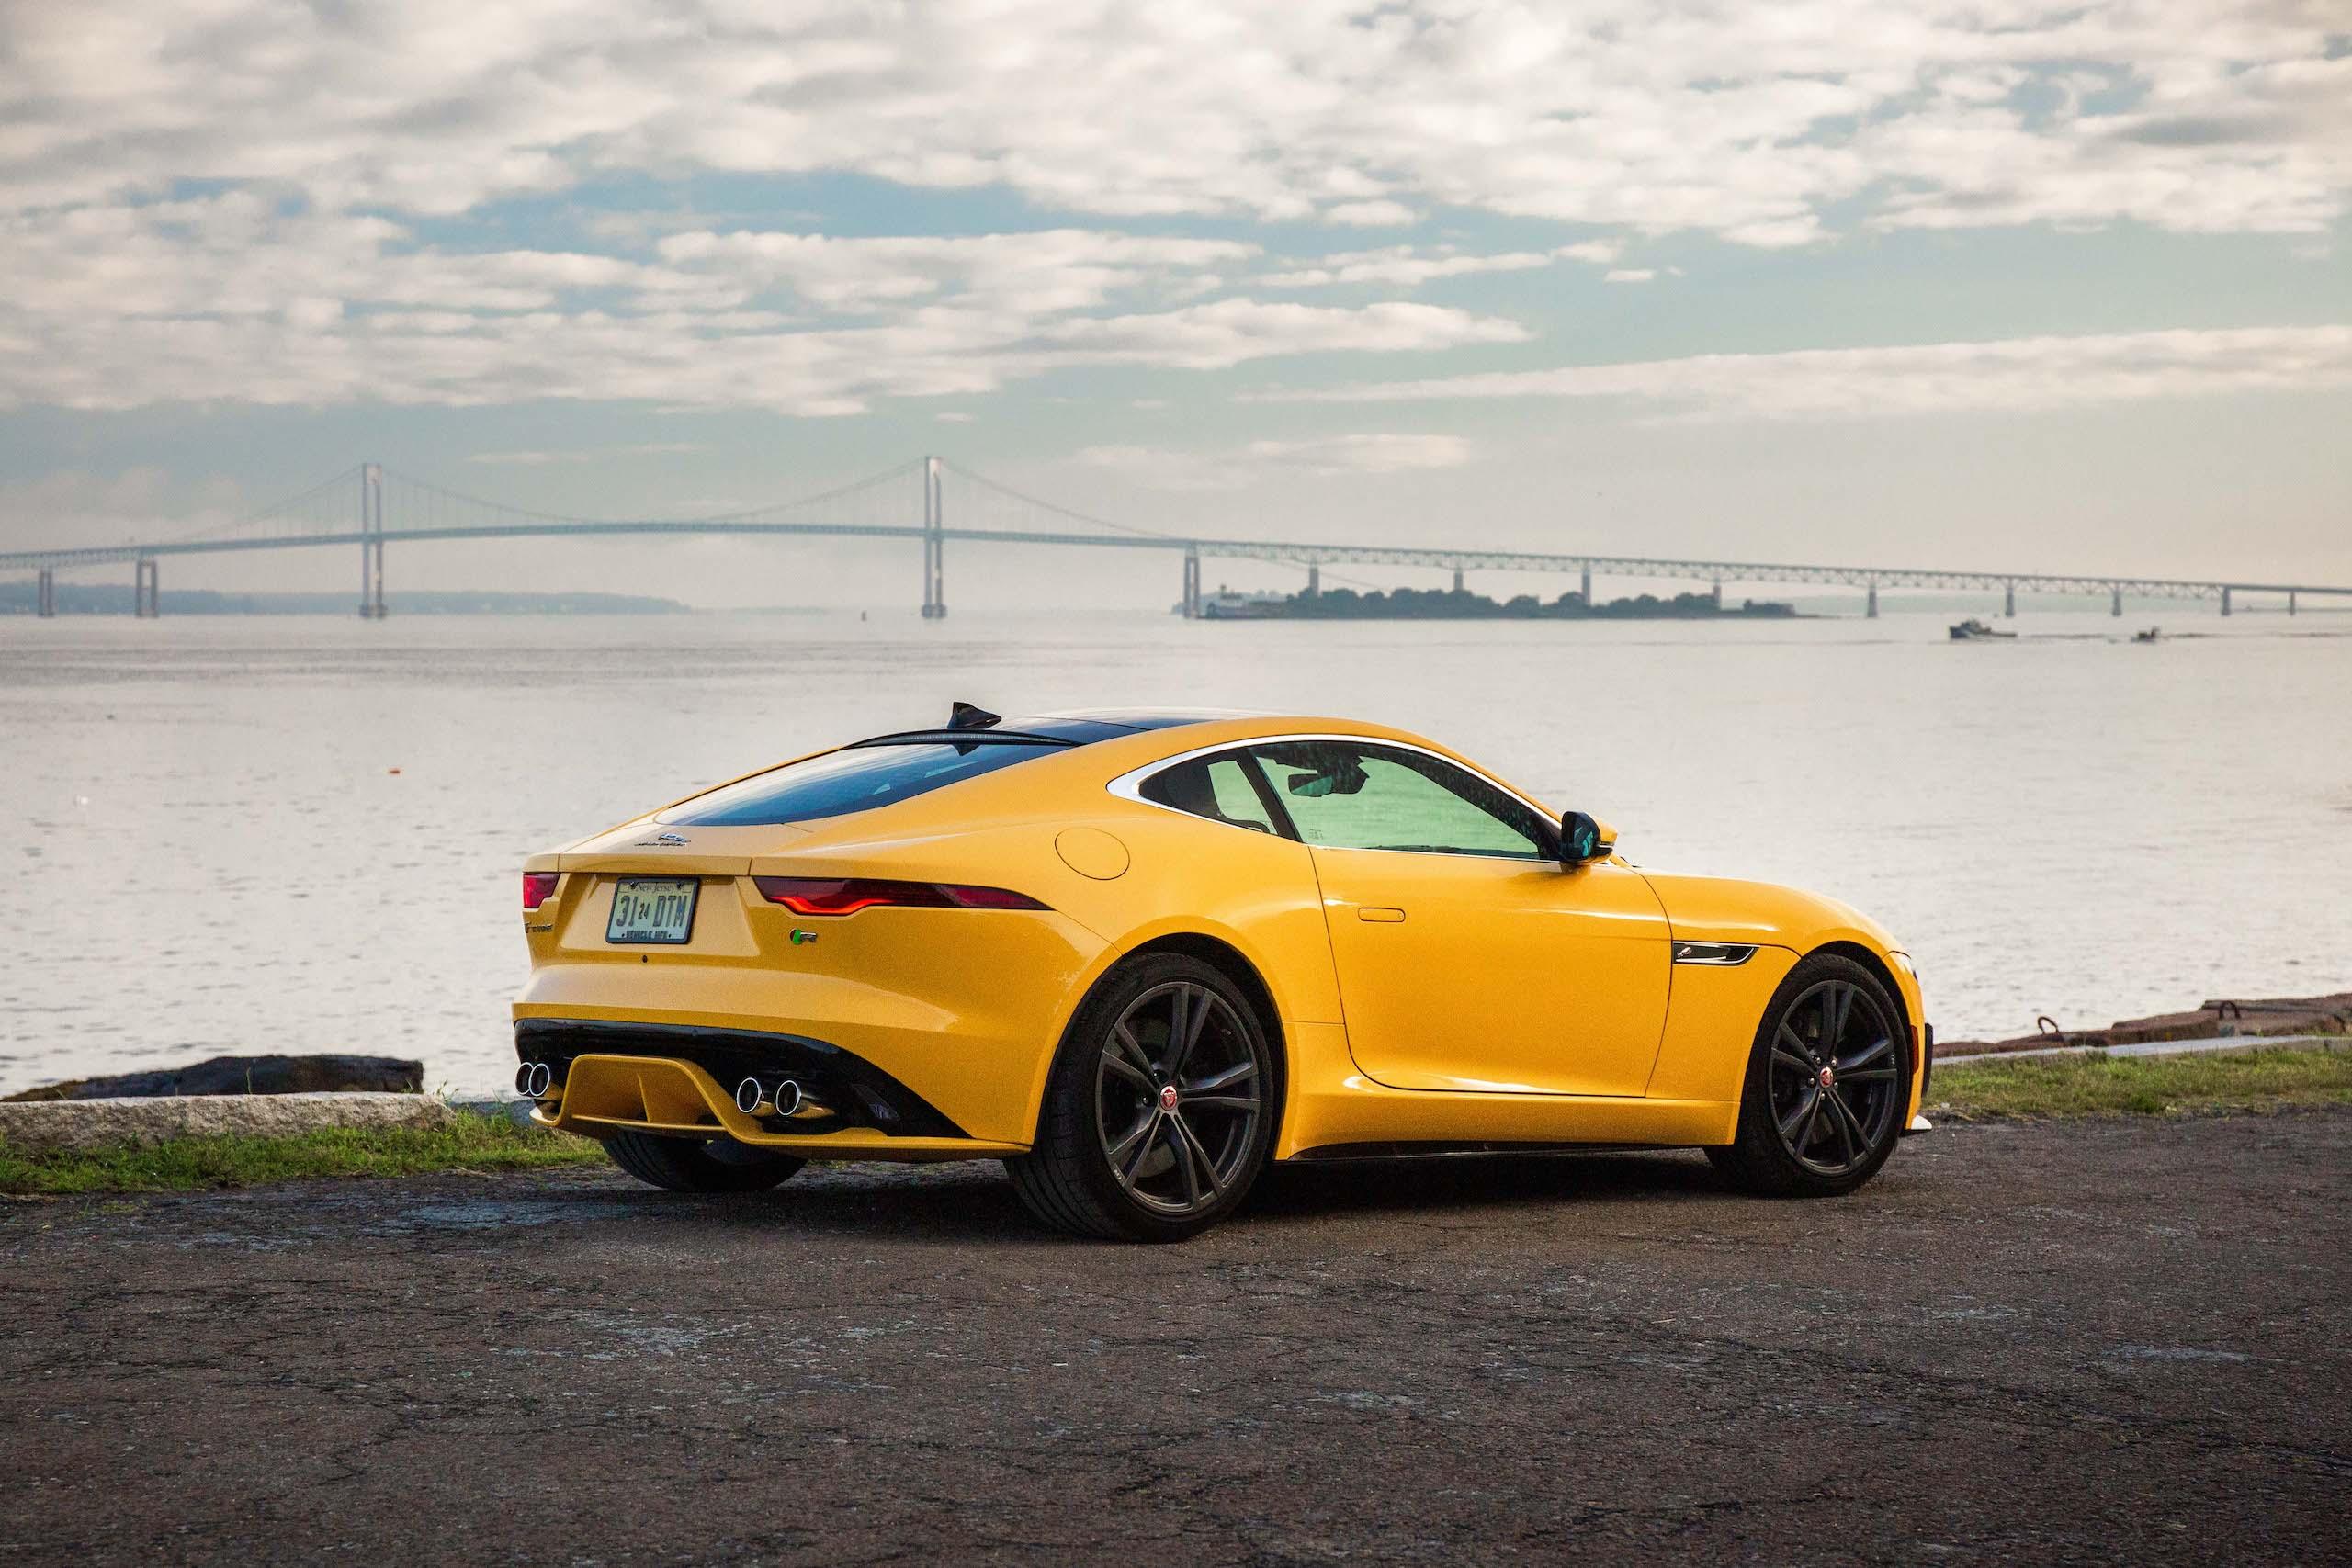 2021 Jaguar F-TYPE_R Coupe rear three-quarter